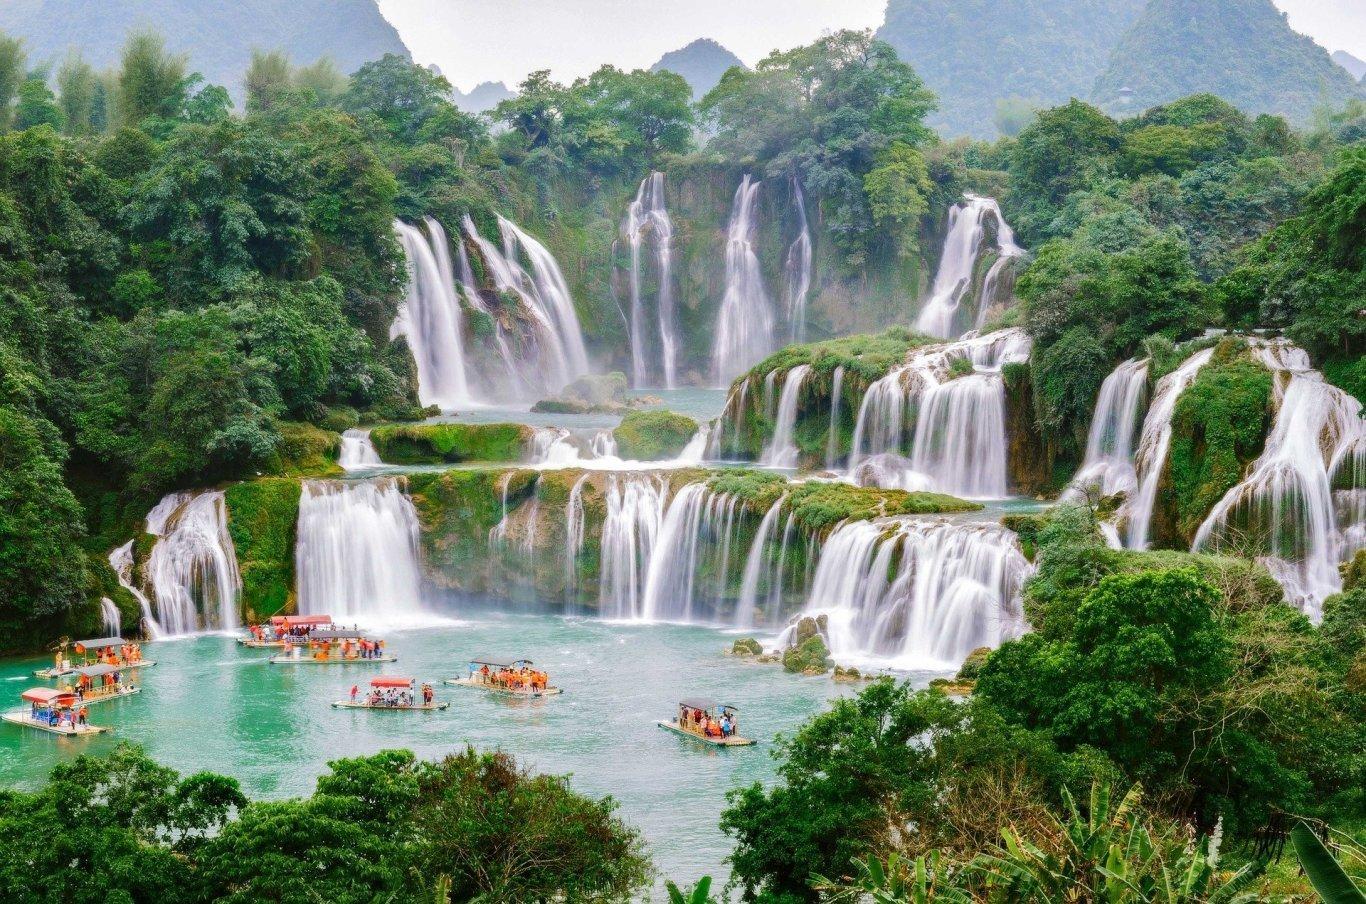 3-Day Ba Be Lake & Ban Gioc Waterfall - Vietnam Itinerary